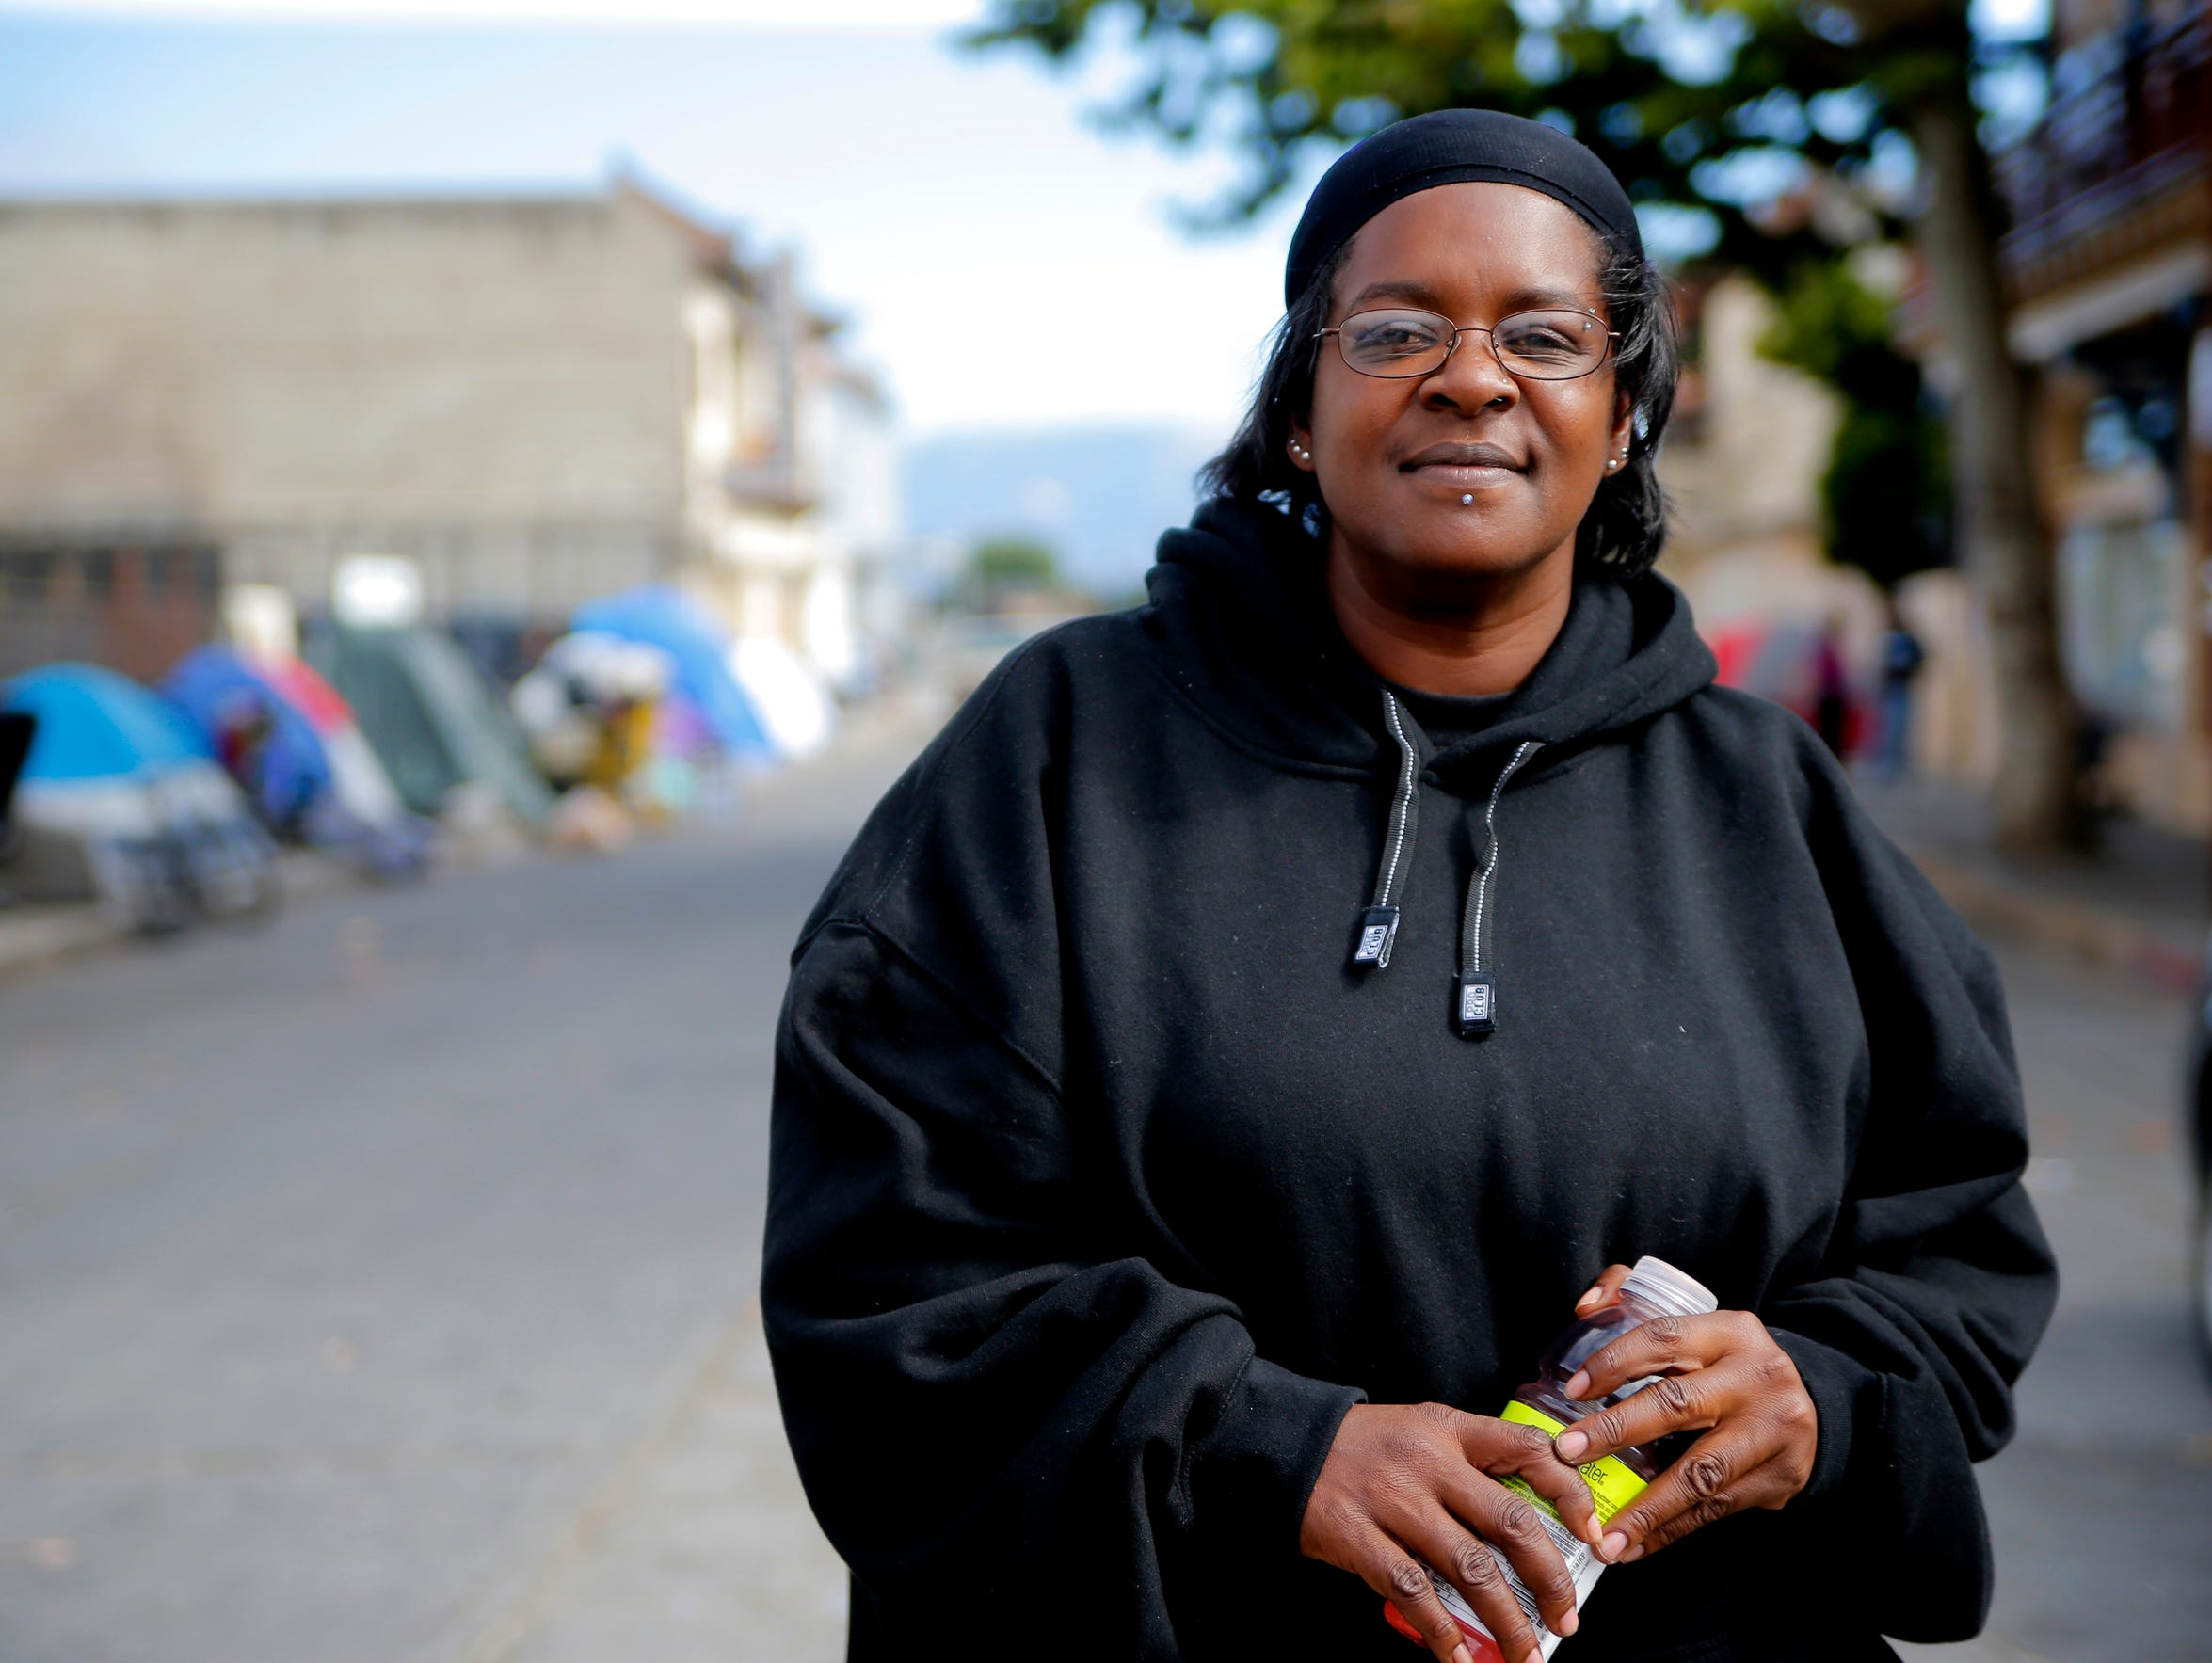 Yolanda Harraway called the streets of Chinatown her